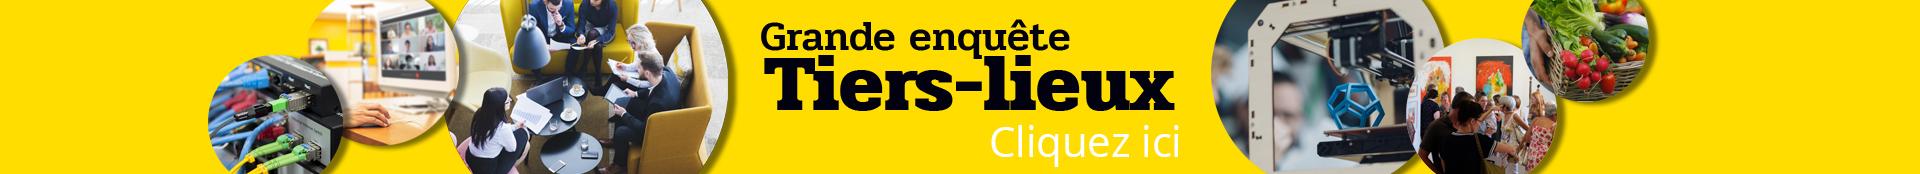 bandeau_tiers_lieux_web.jpg